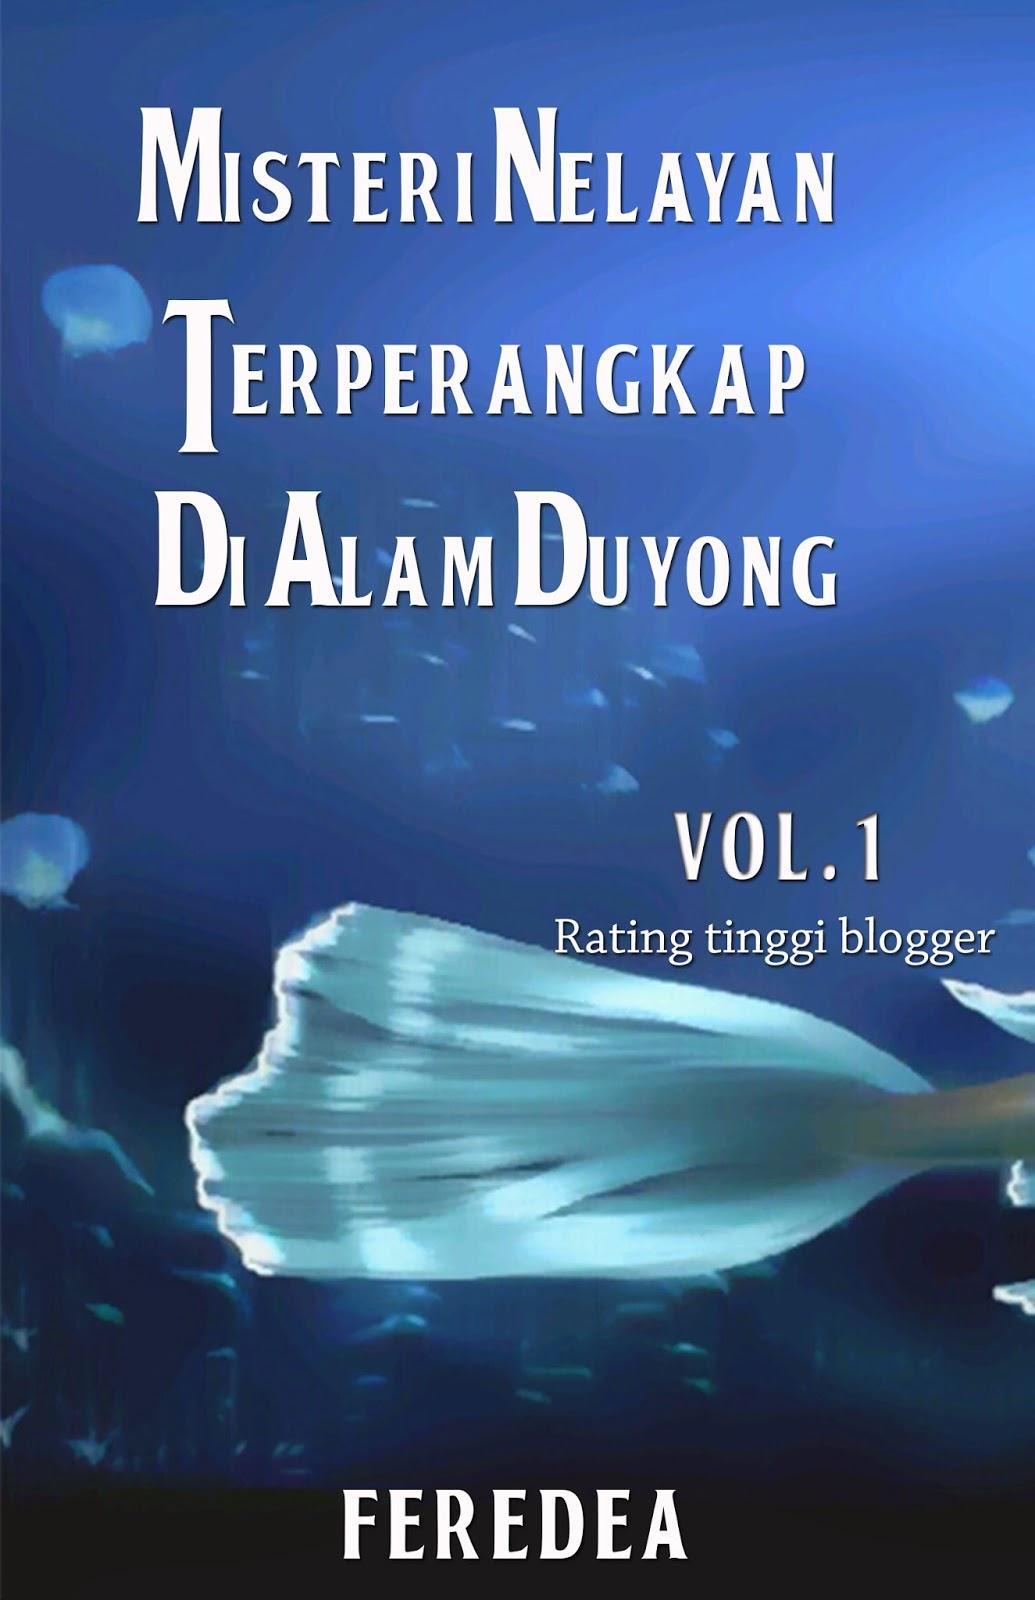 https://play.google.com/store/books/details/Feredea_Power_Misteri_Nelayan_Terperangkap_di_Alam?id=8AJ8AgAAQBAJ